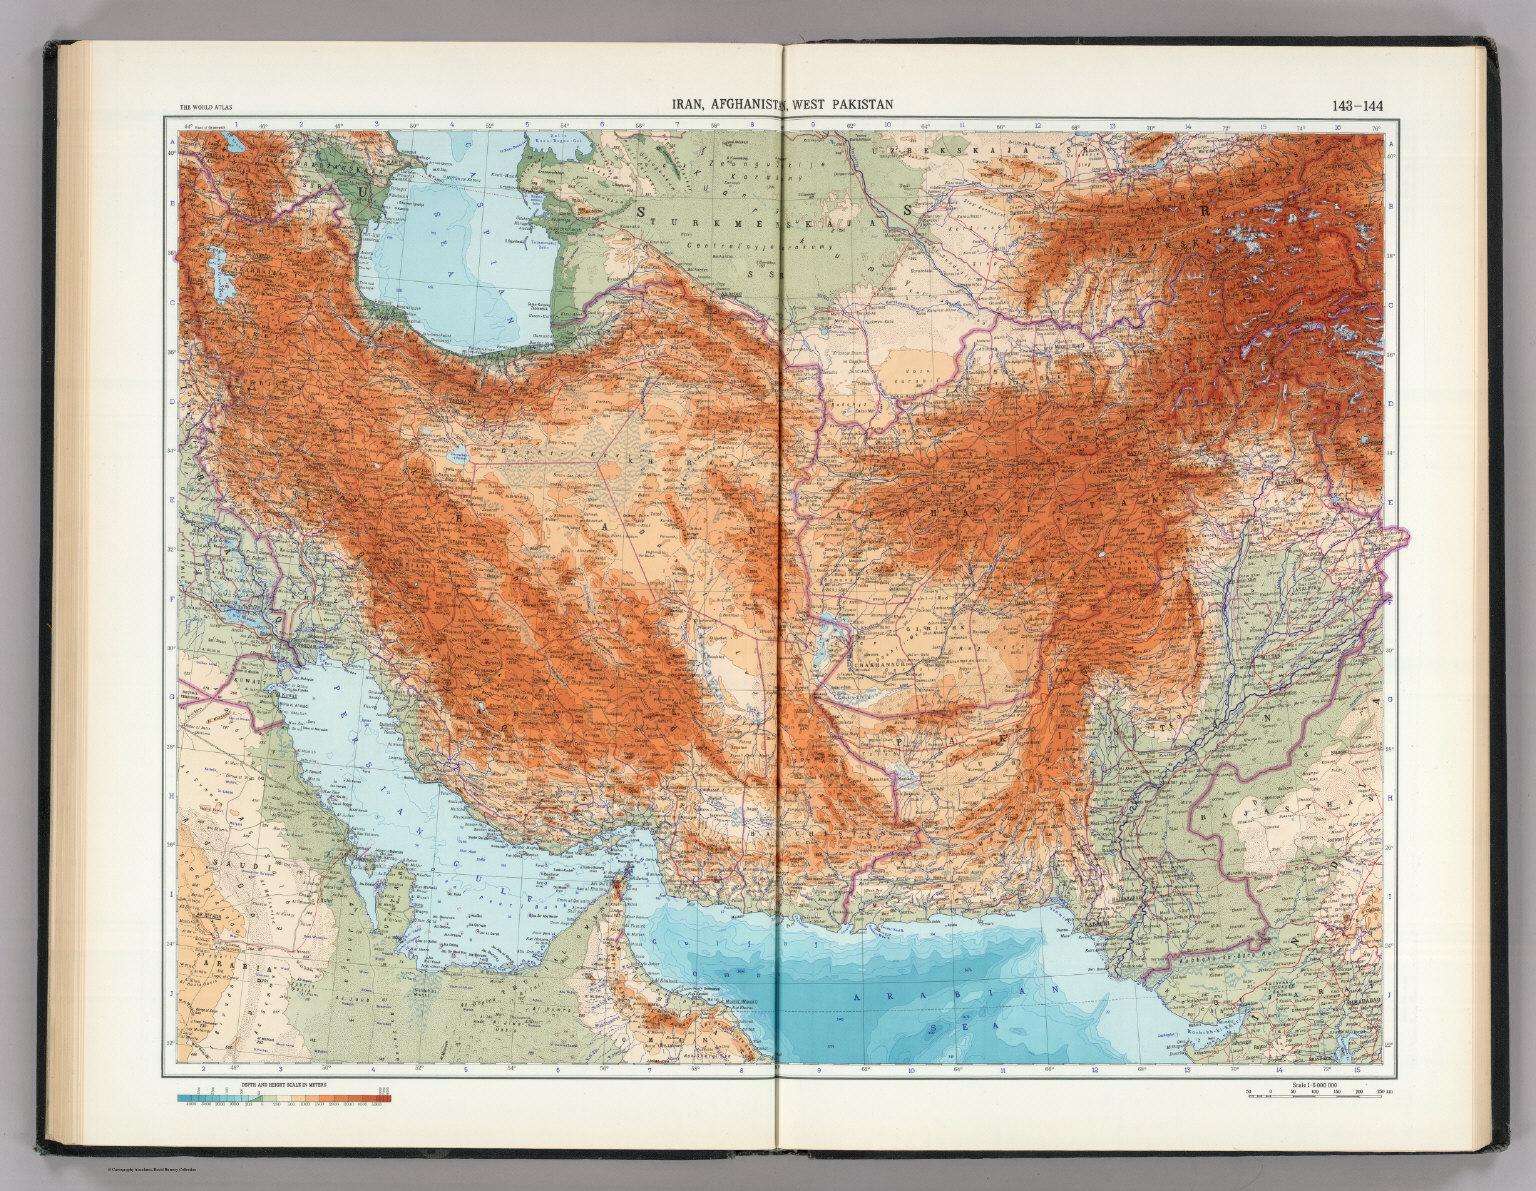 143 144 iran afghanistan west pakistan the world atlas david iran afghanistan west pakistan the world atlas gumiabroncs Choice Image